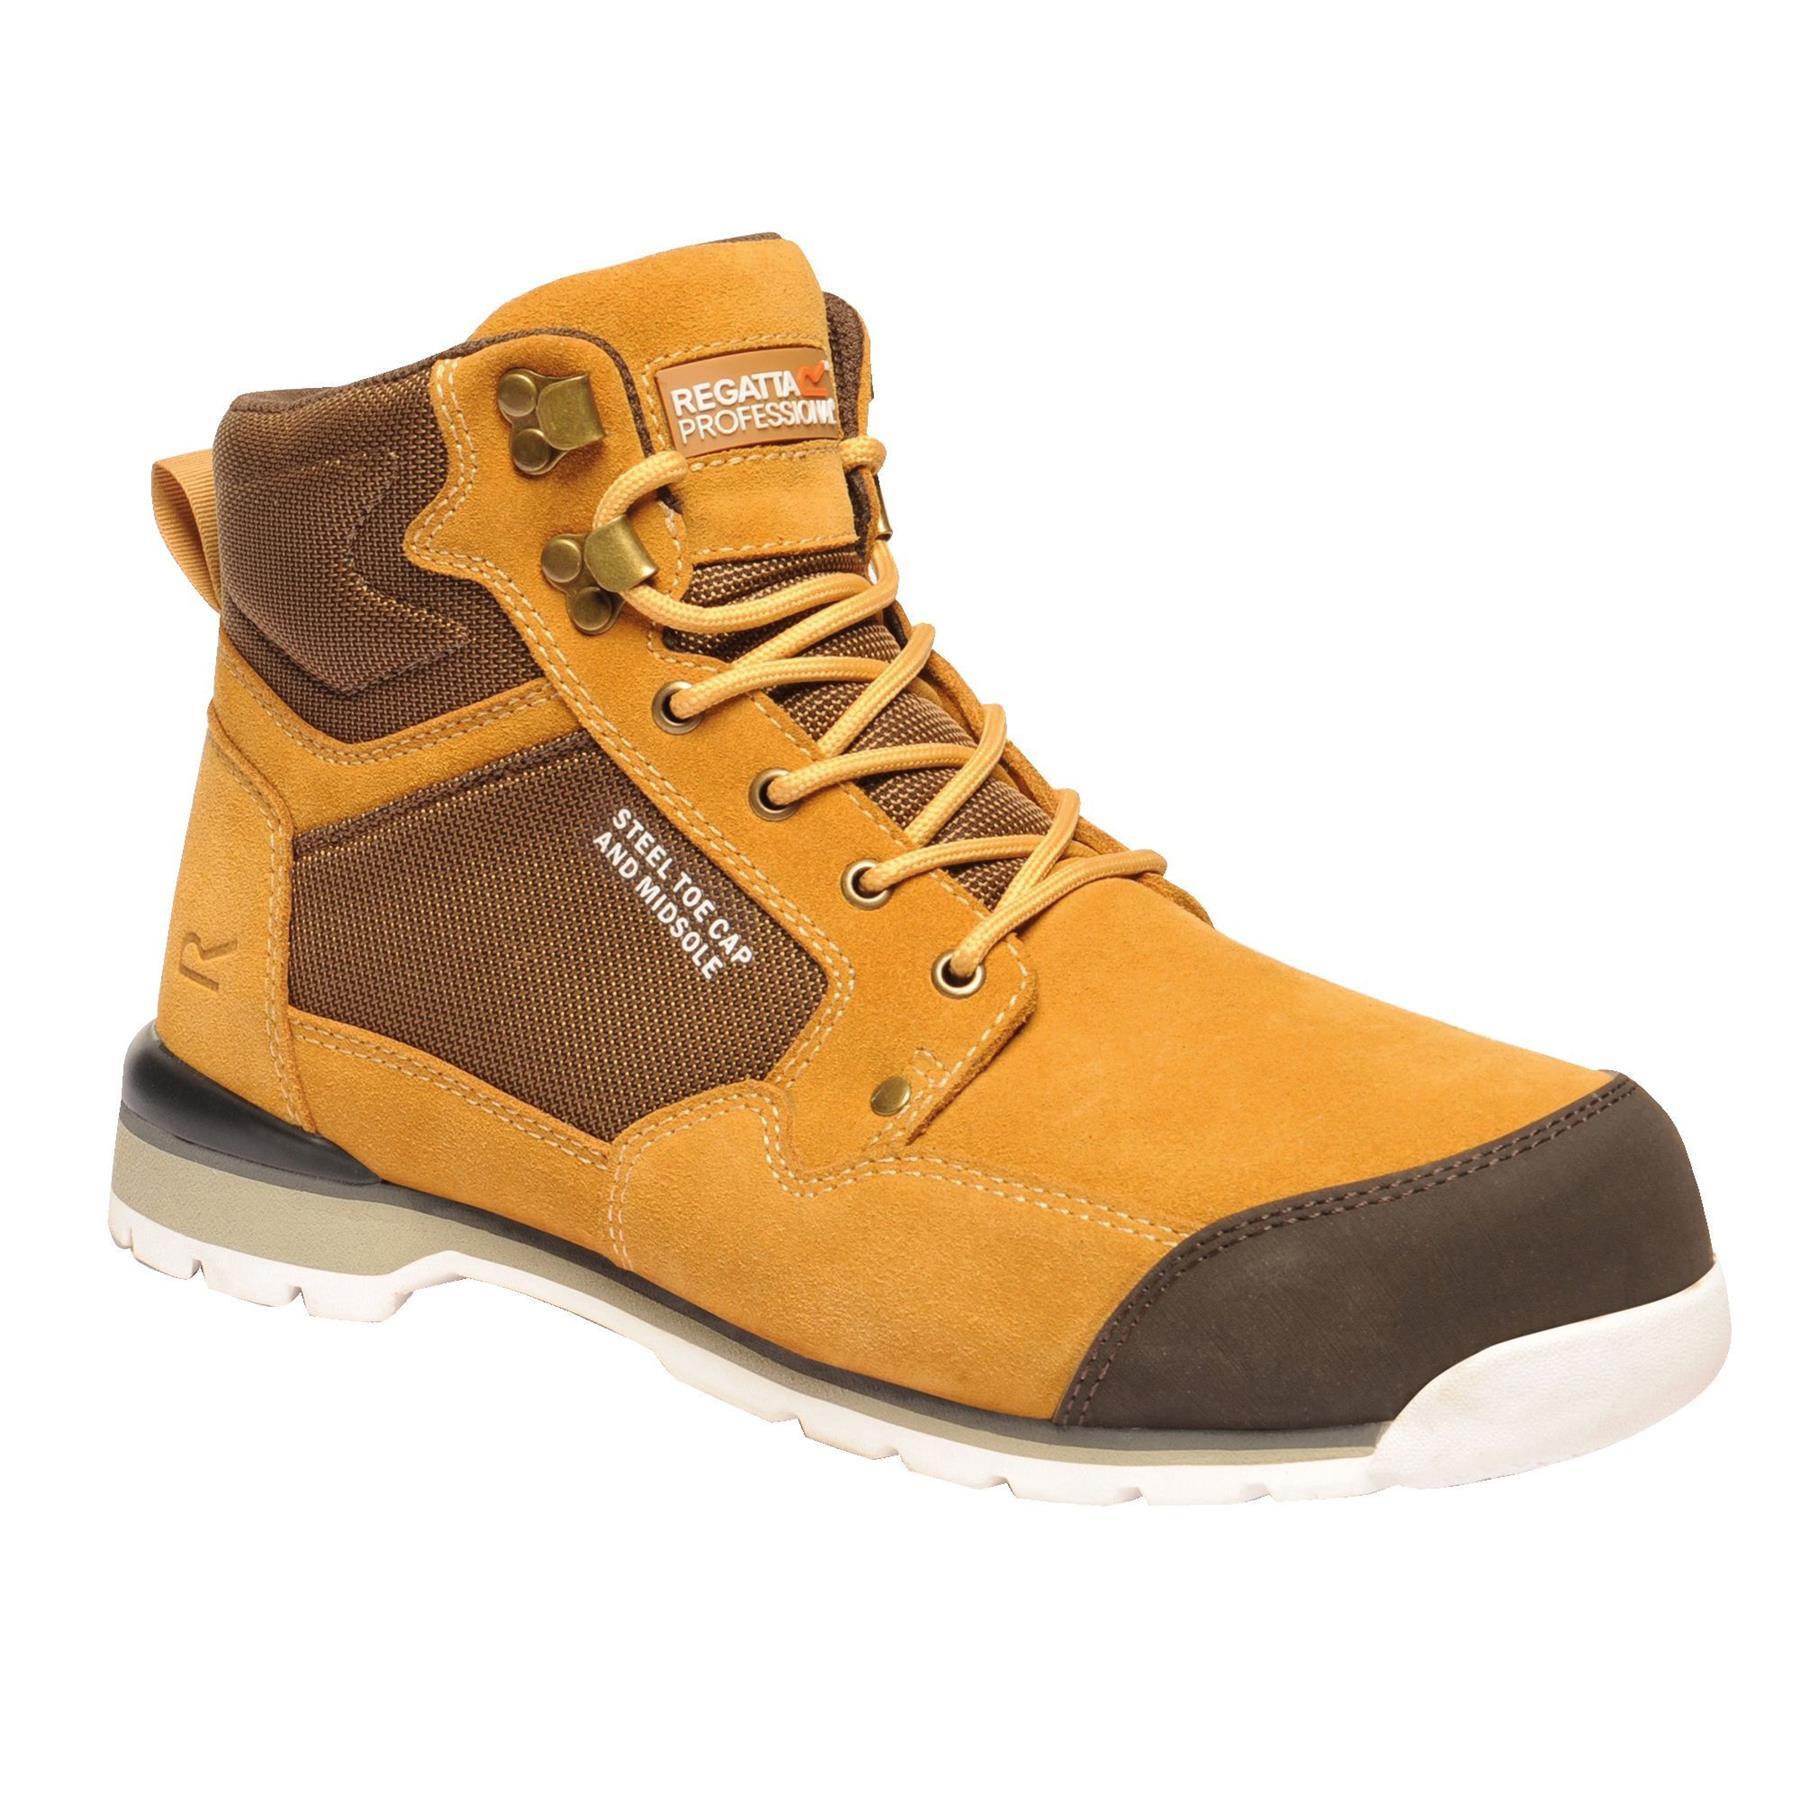 miniatuur 15 - Regatta Mens Work Safety Protective Shoes Steel Toe Cap Boots Workwear